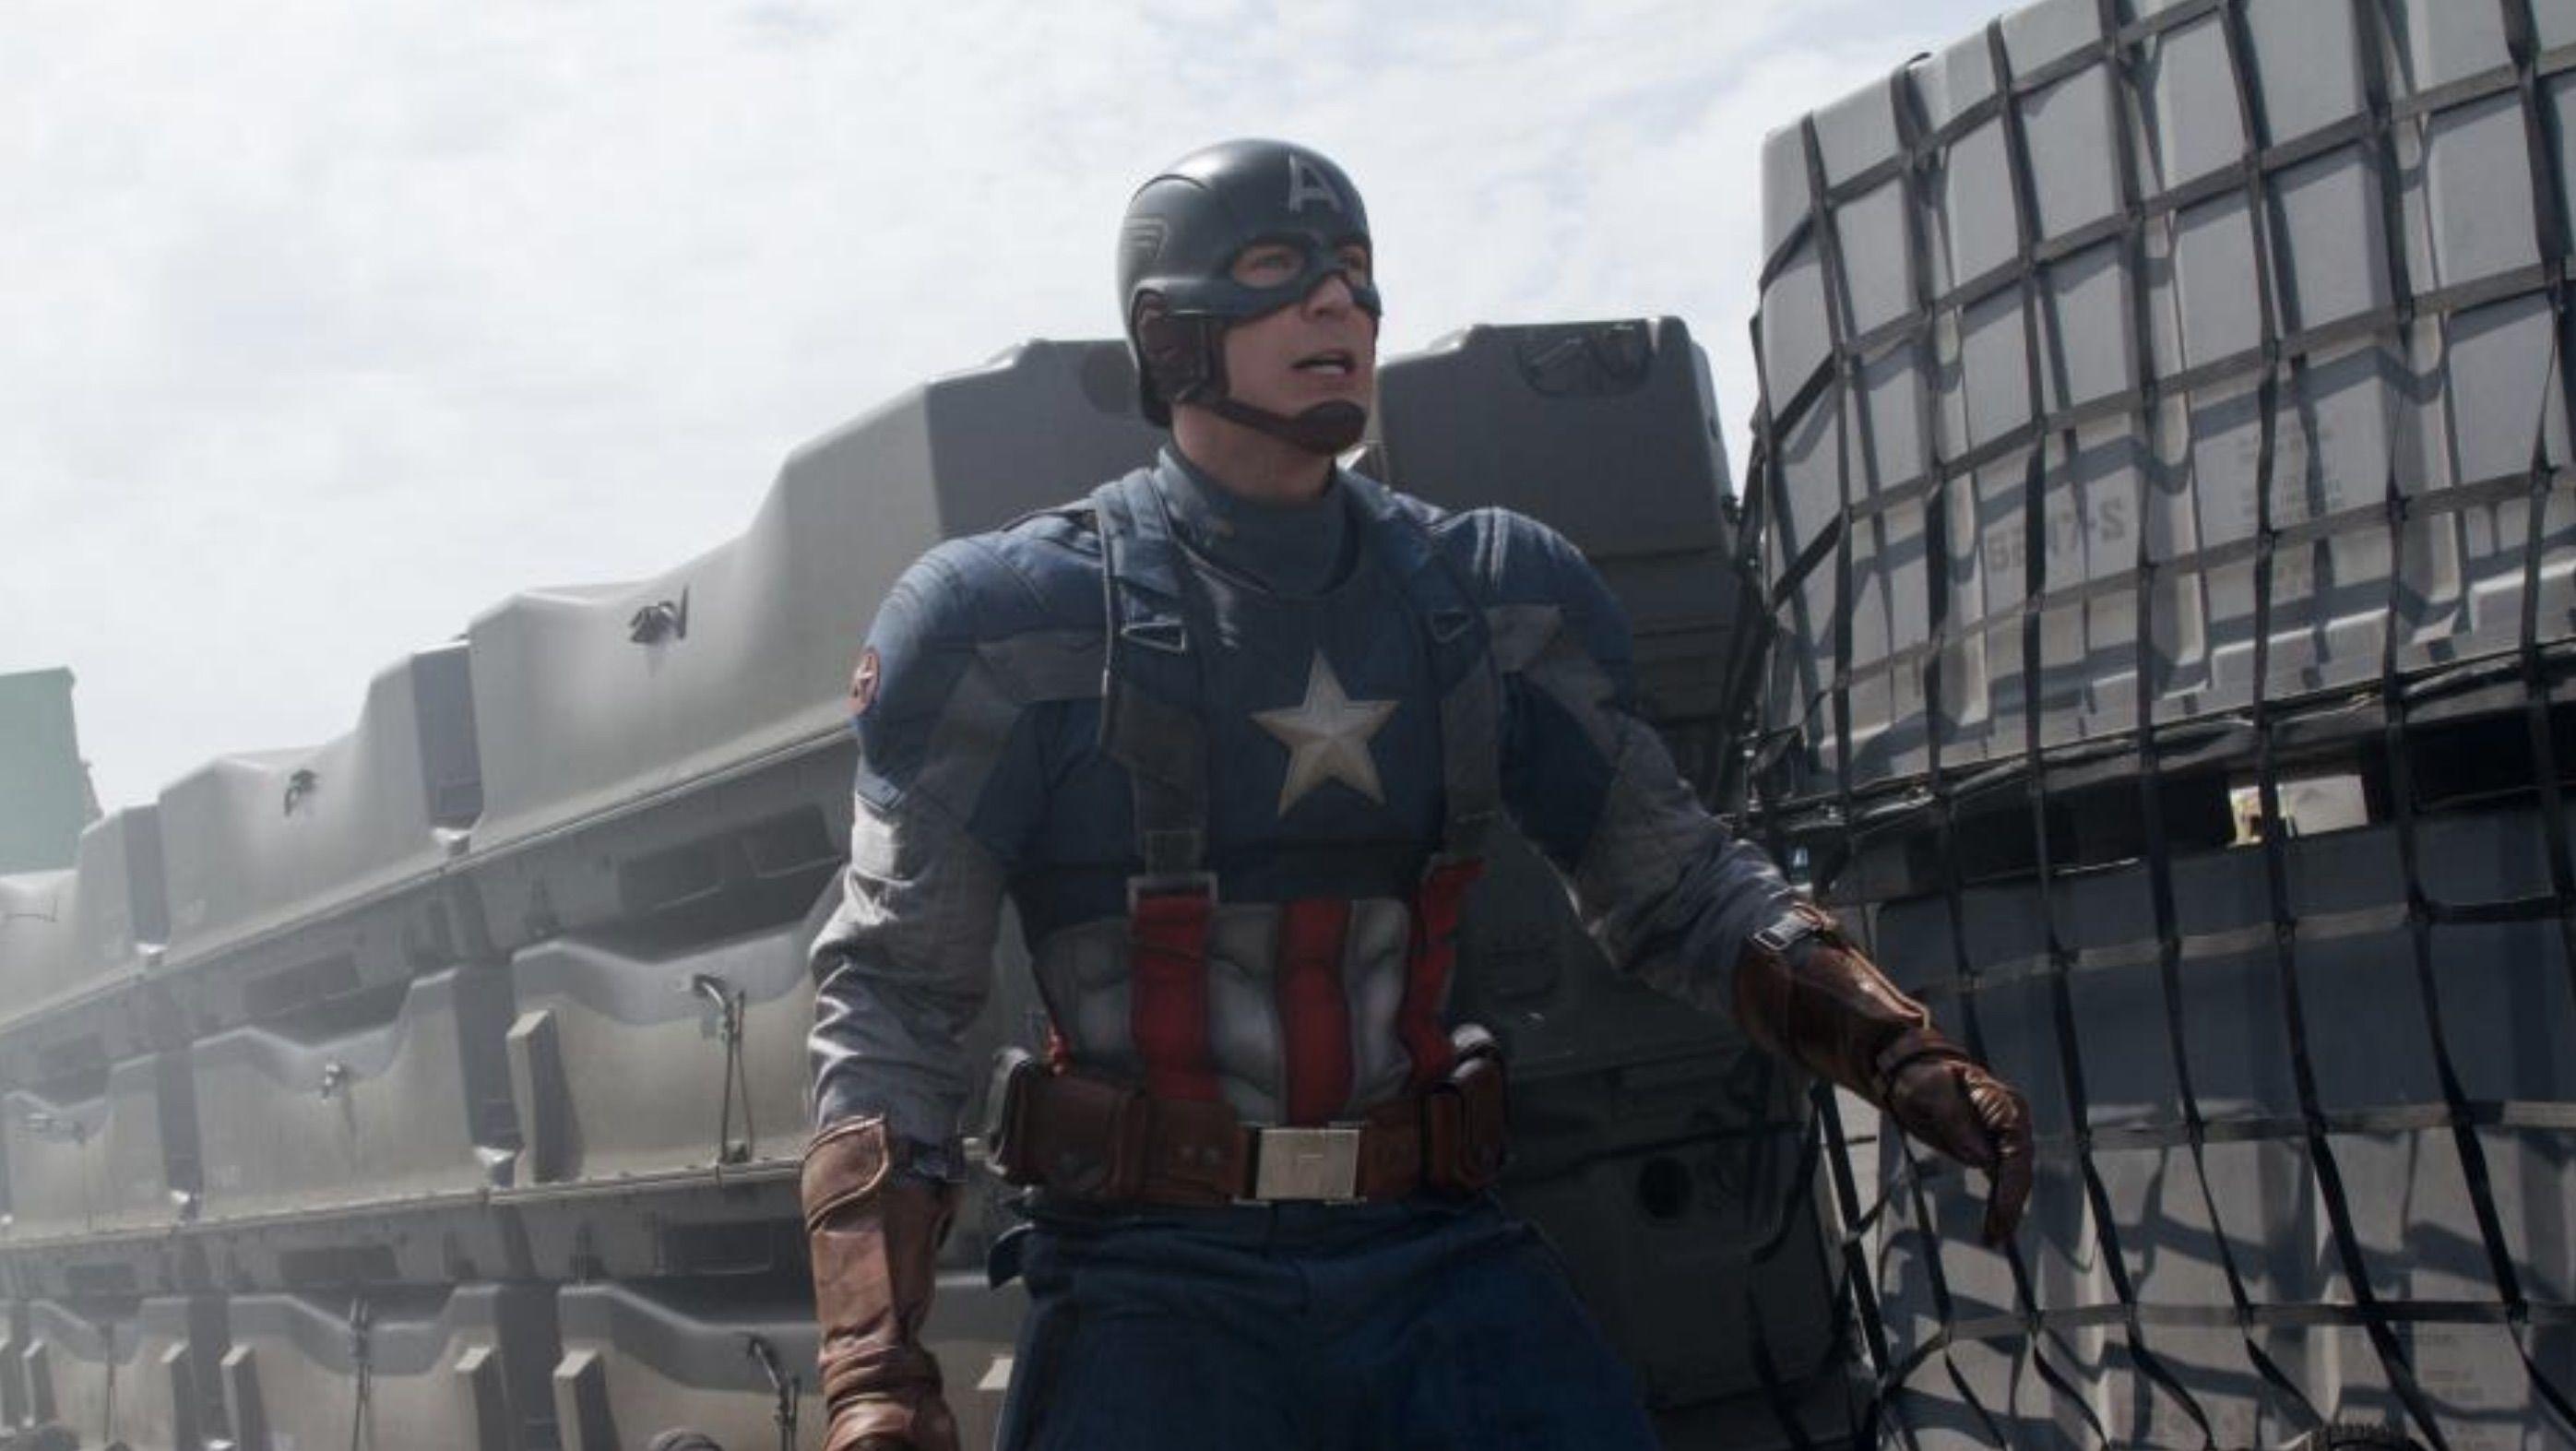 The Writers of <em>Avengers: Endgame</em> Explain Why Captain America Wasn't Able to Lift Thor's Hammer